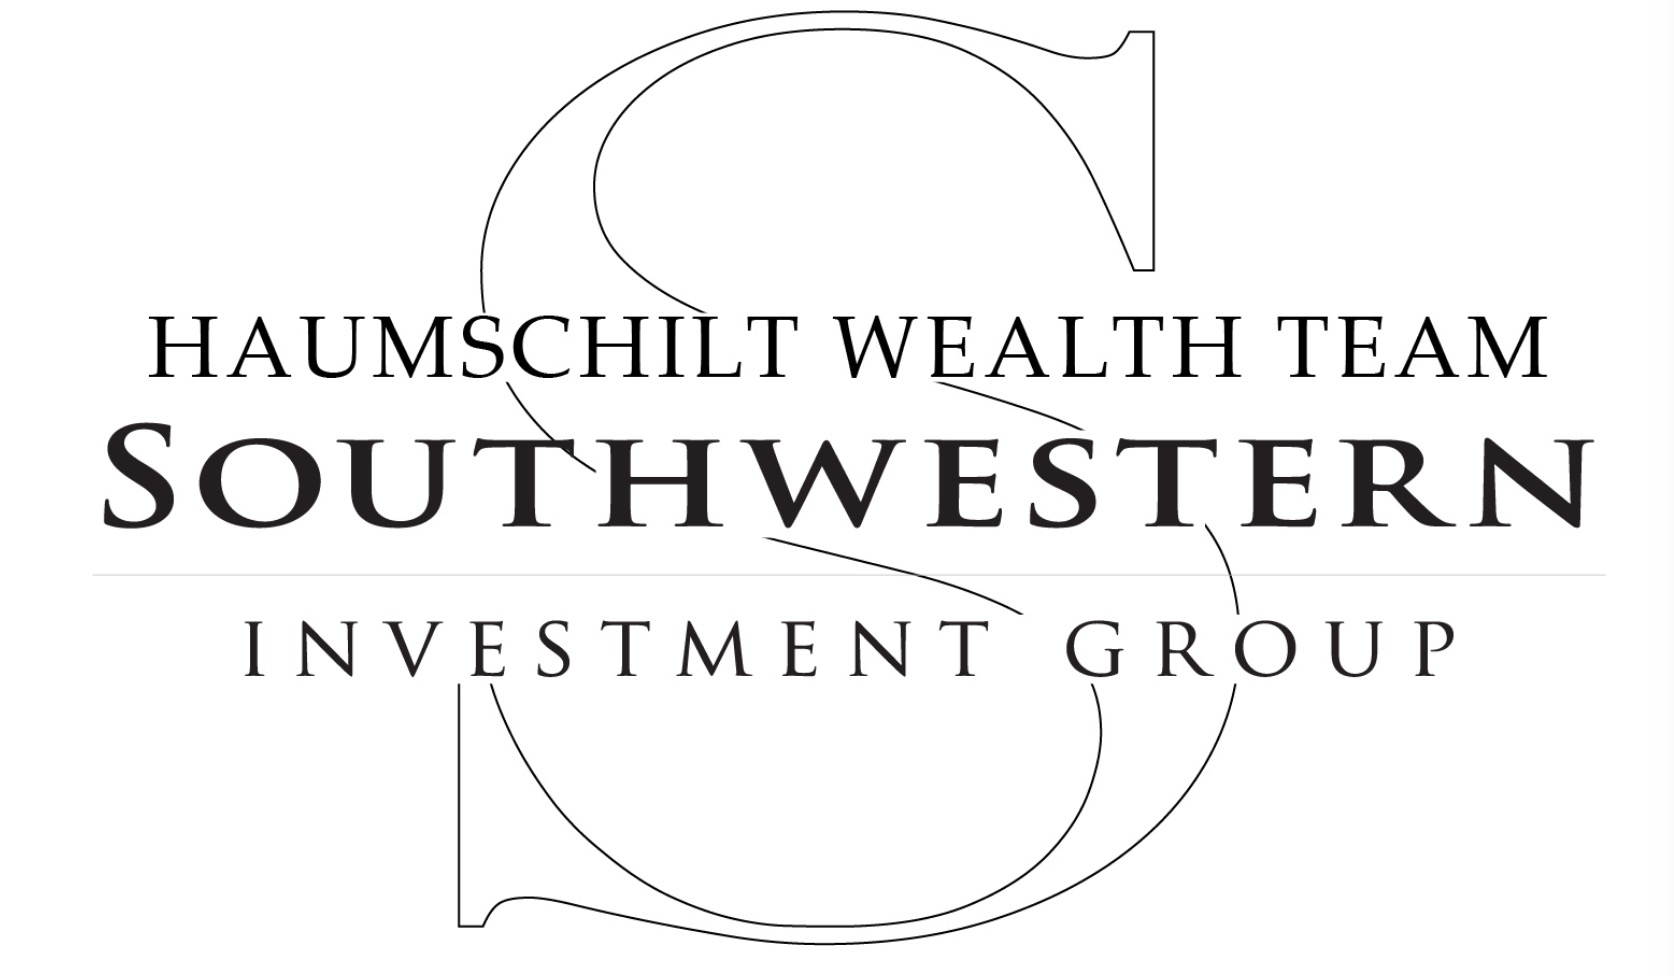 Haumschilt Wealth Team